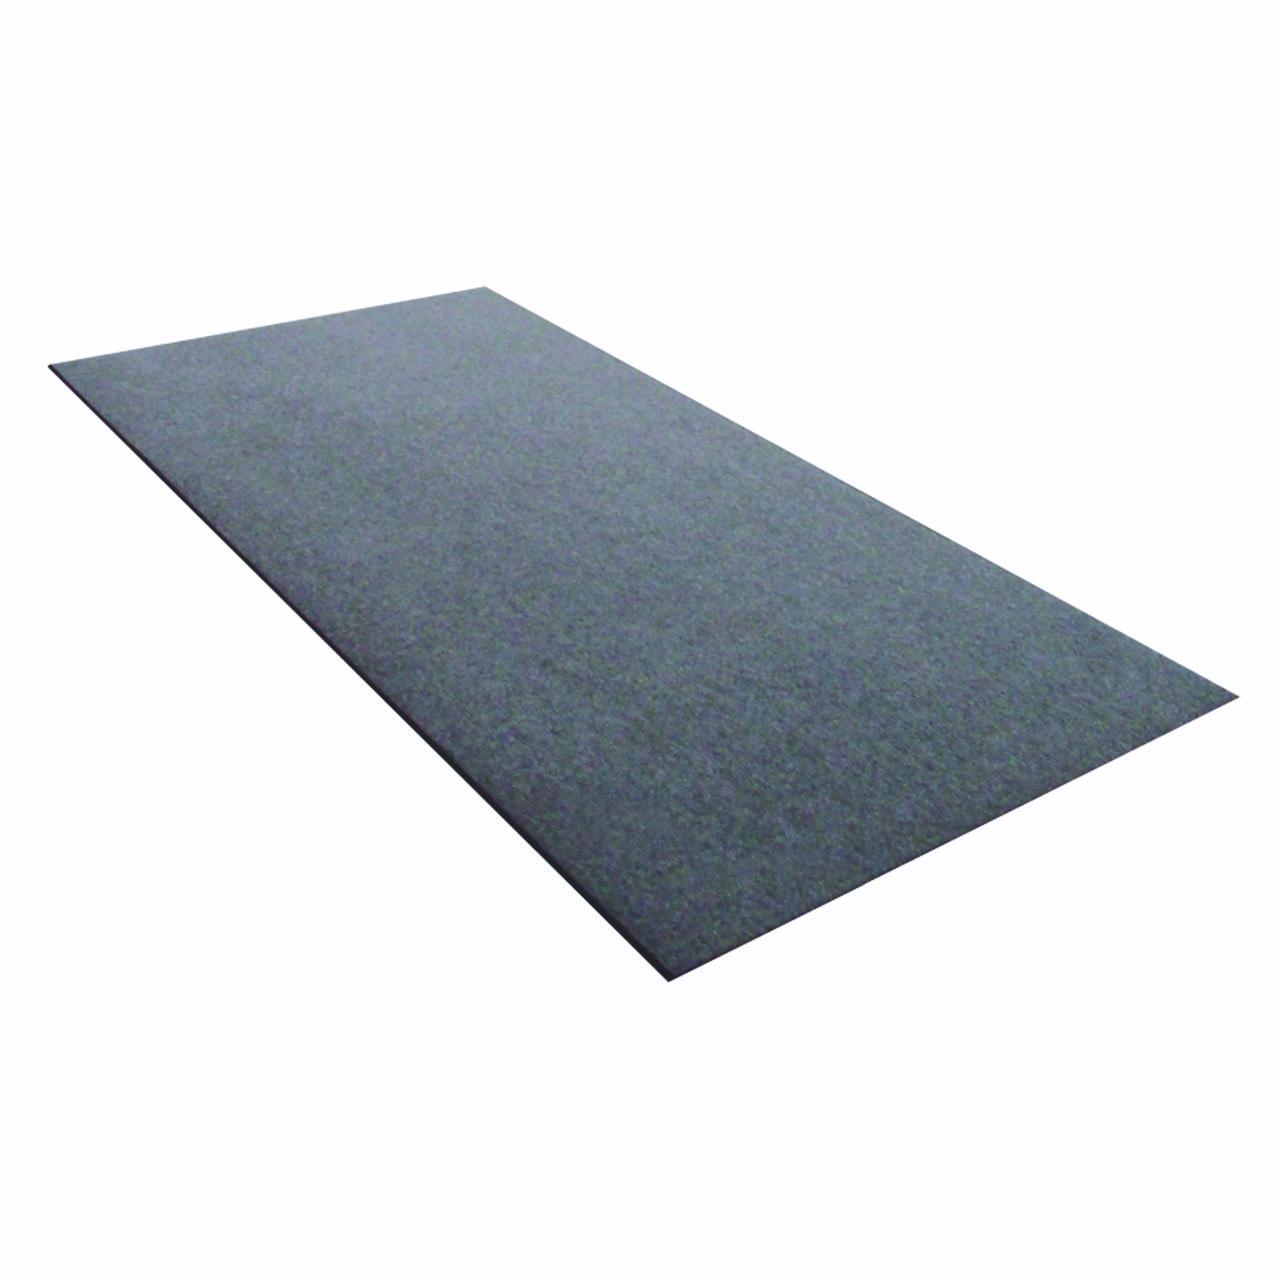 EBC - Gym Floor Cover